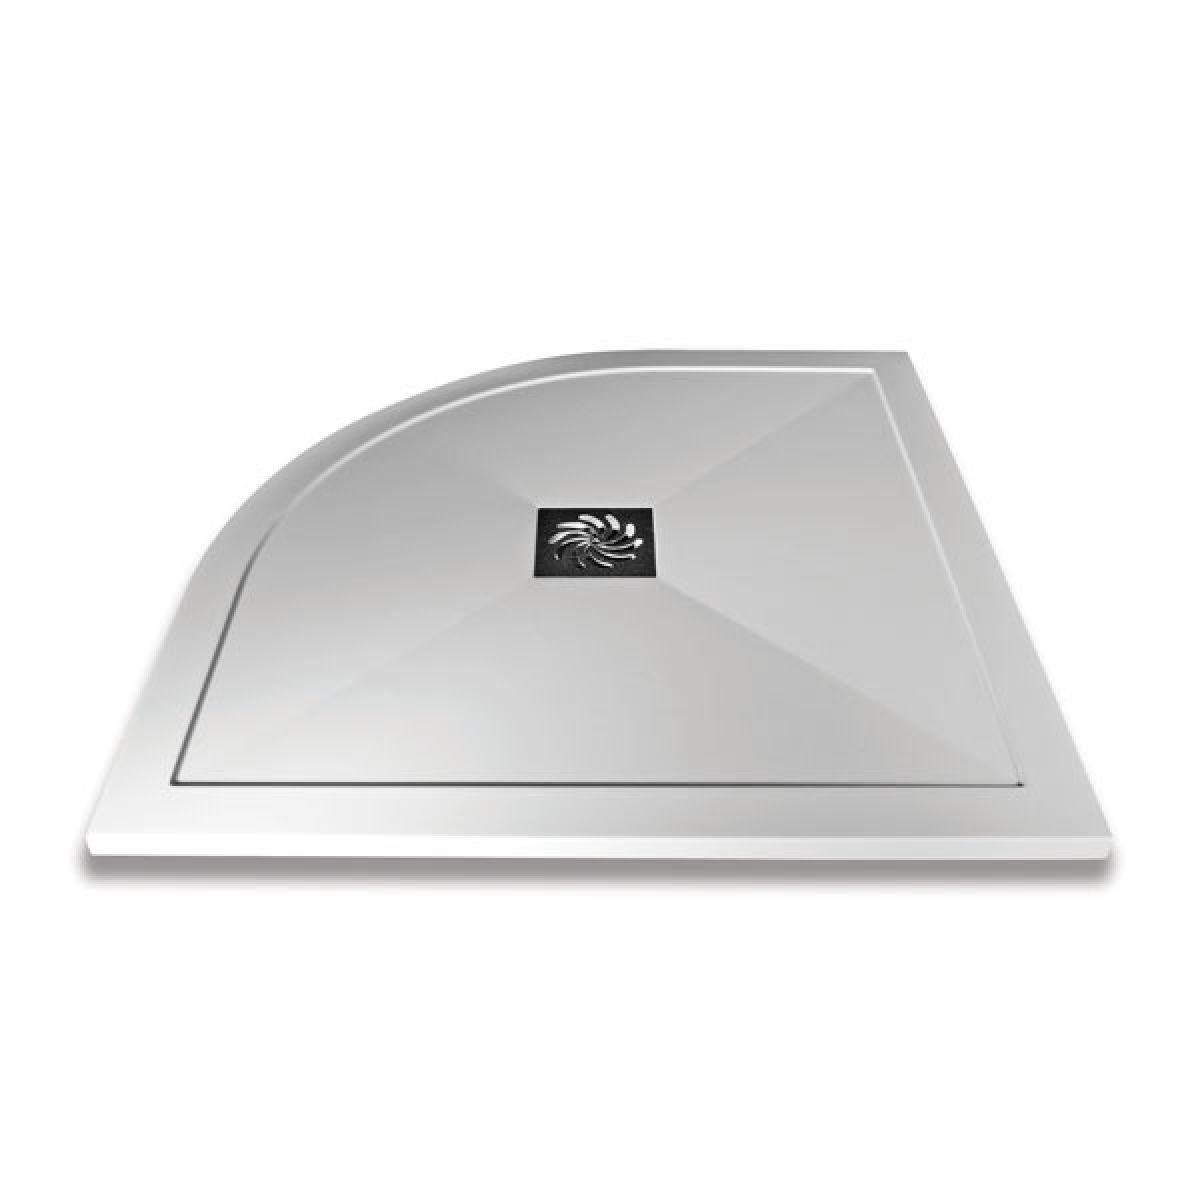 Frontline Slimline Quadrant Shower Tray 800 x 800mm